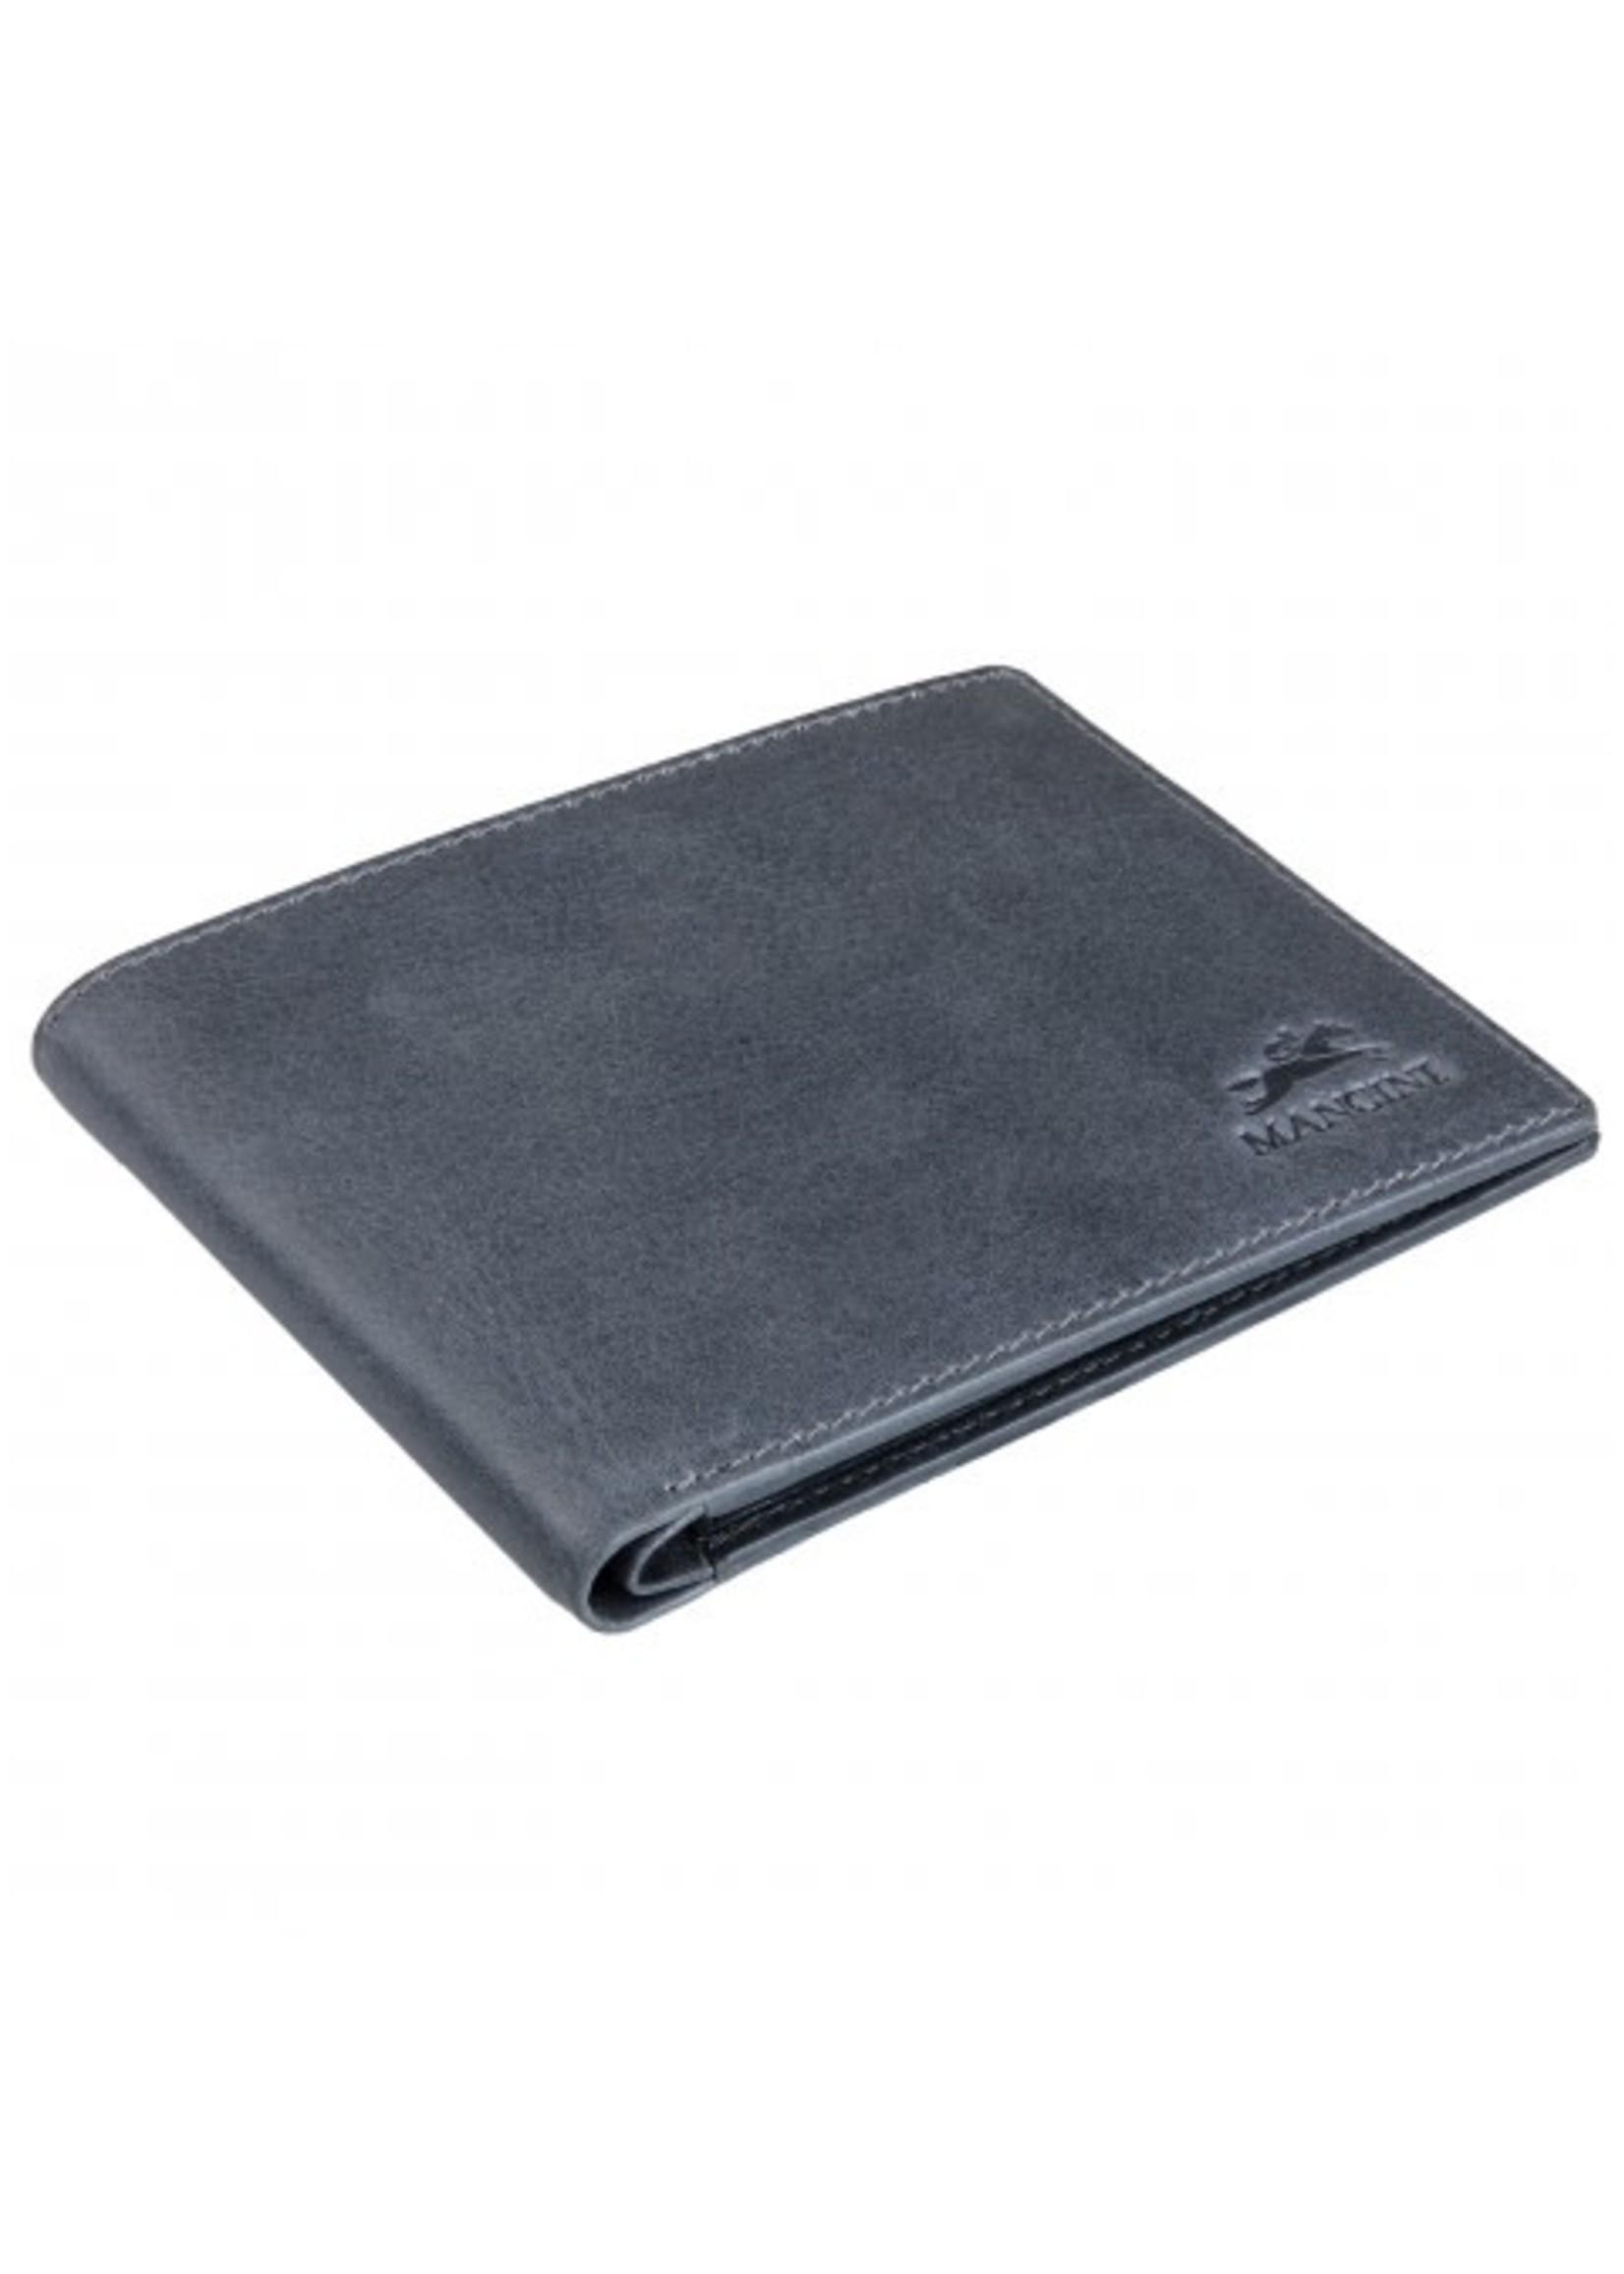 Mancini Men's Leather RFID Billfold